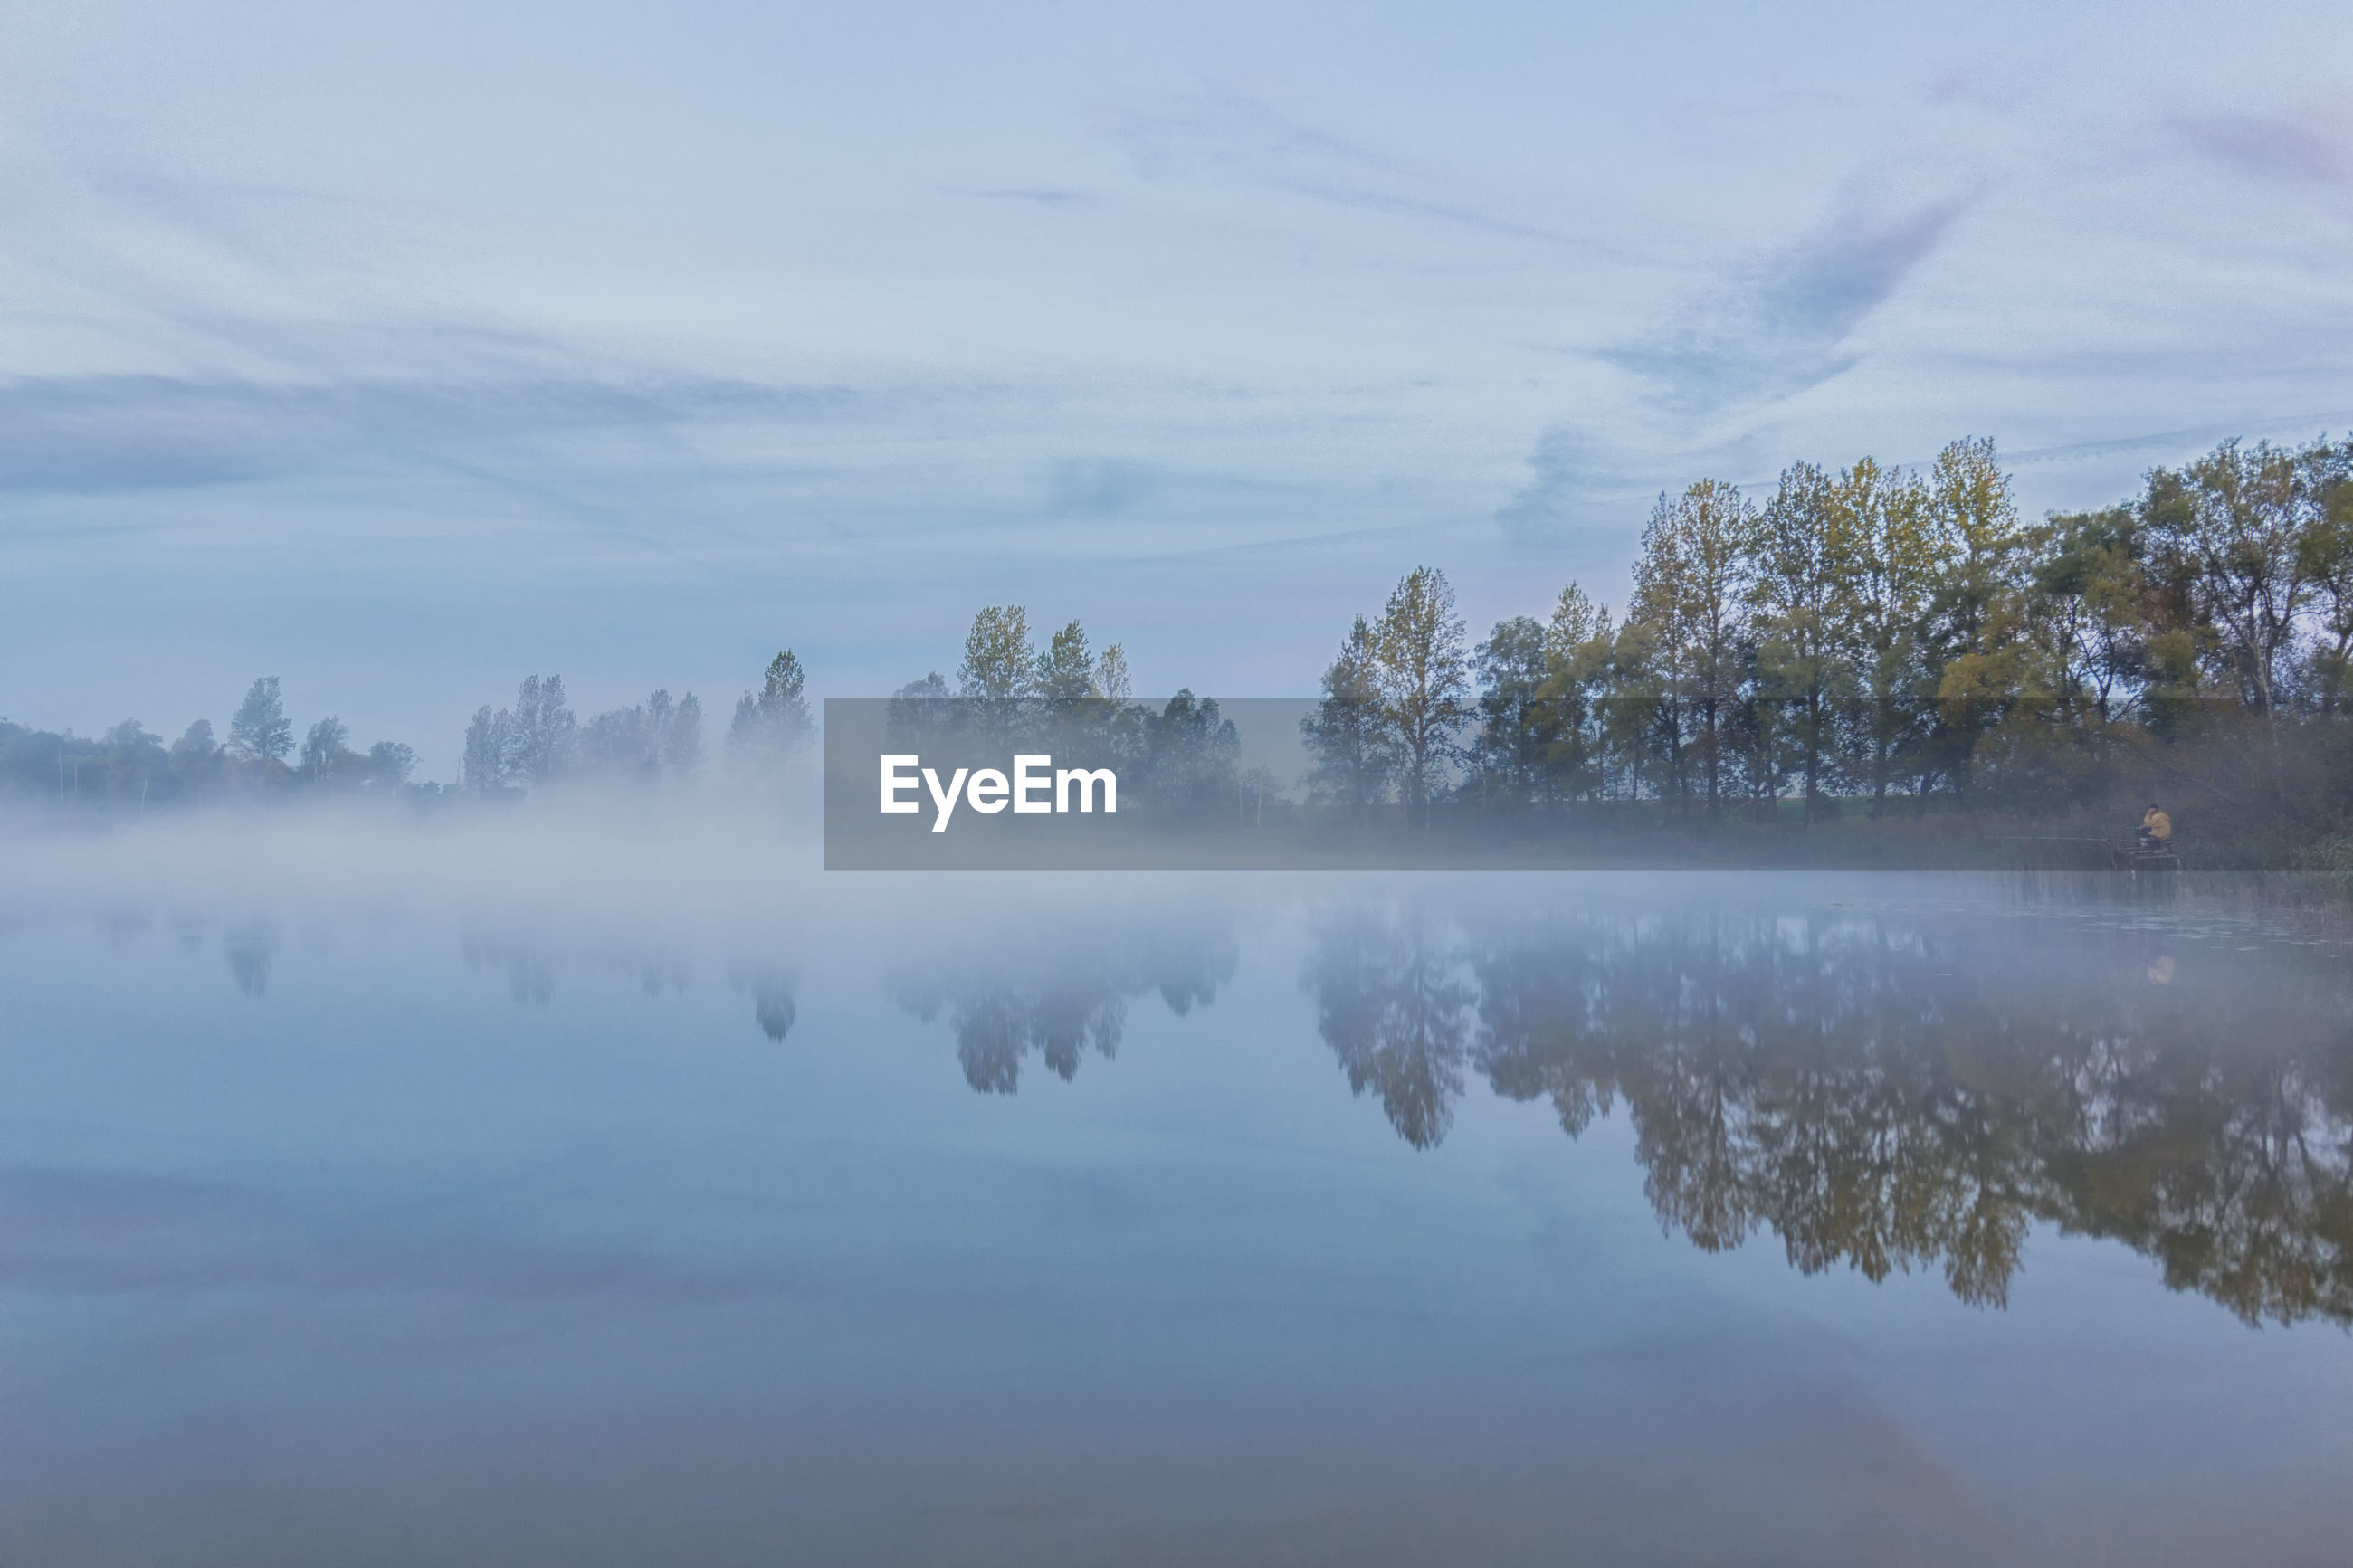 Krzysztof Tollas Autumn Beauty In Nature Fog Foggy Lake Nature Nikon D3100 Nowa Wieś Ujska, Reflection Sky Sunrise Tranquil Scene Tree Village Water